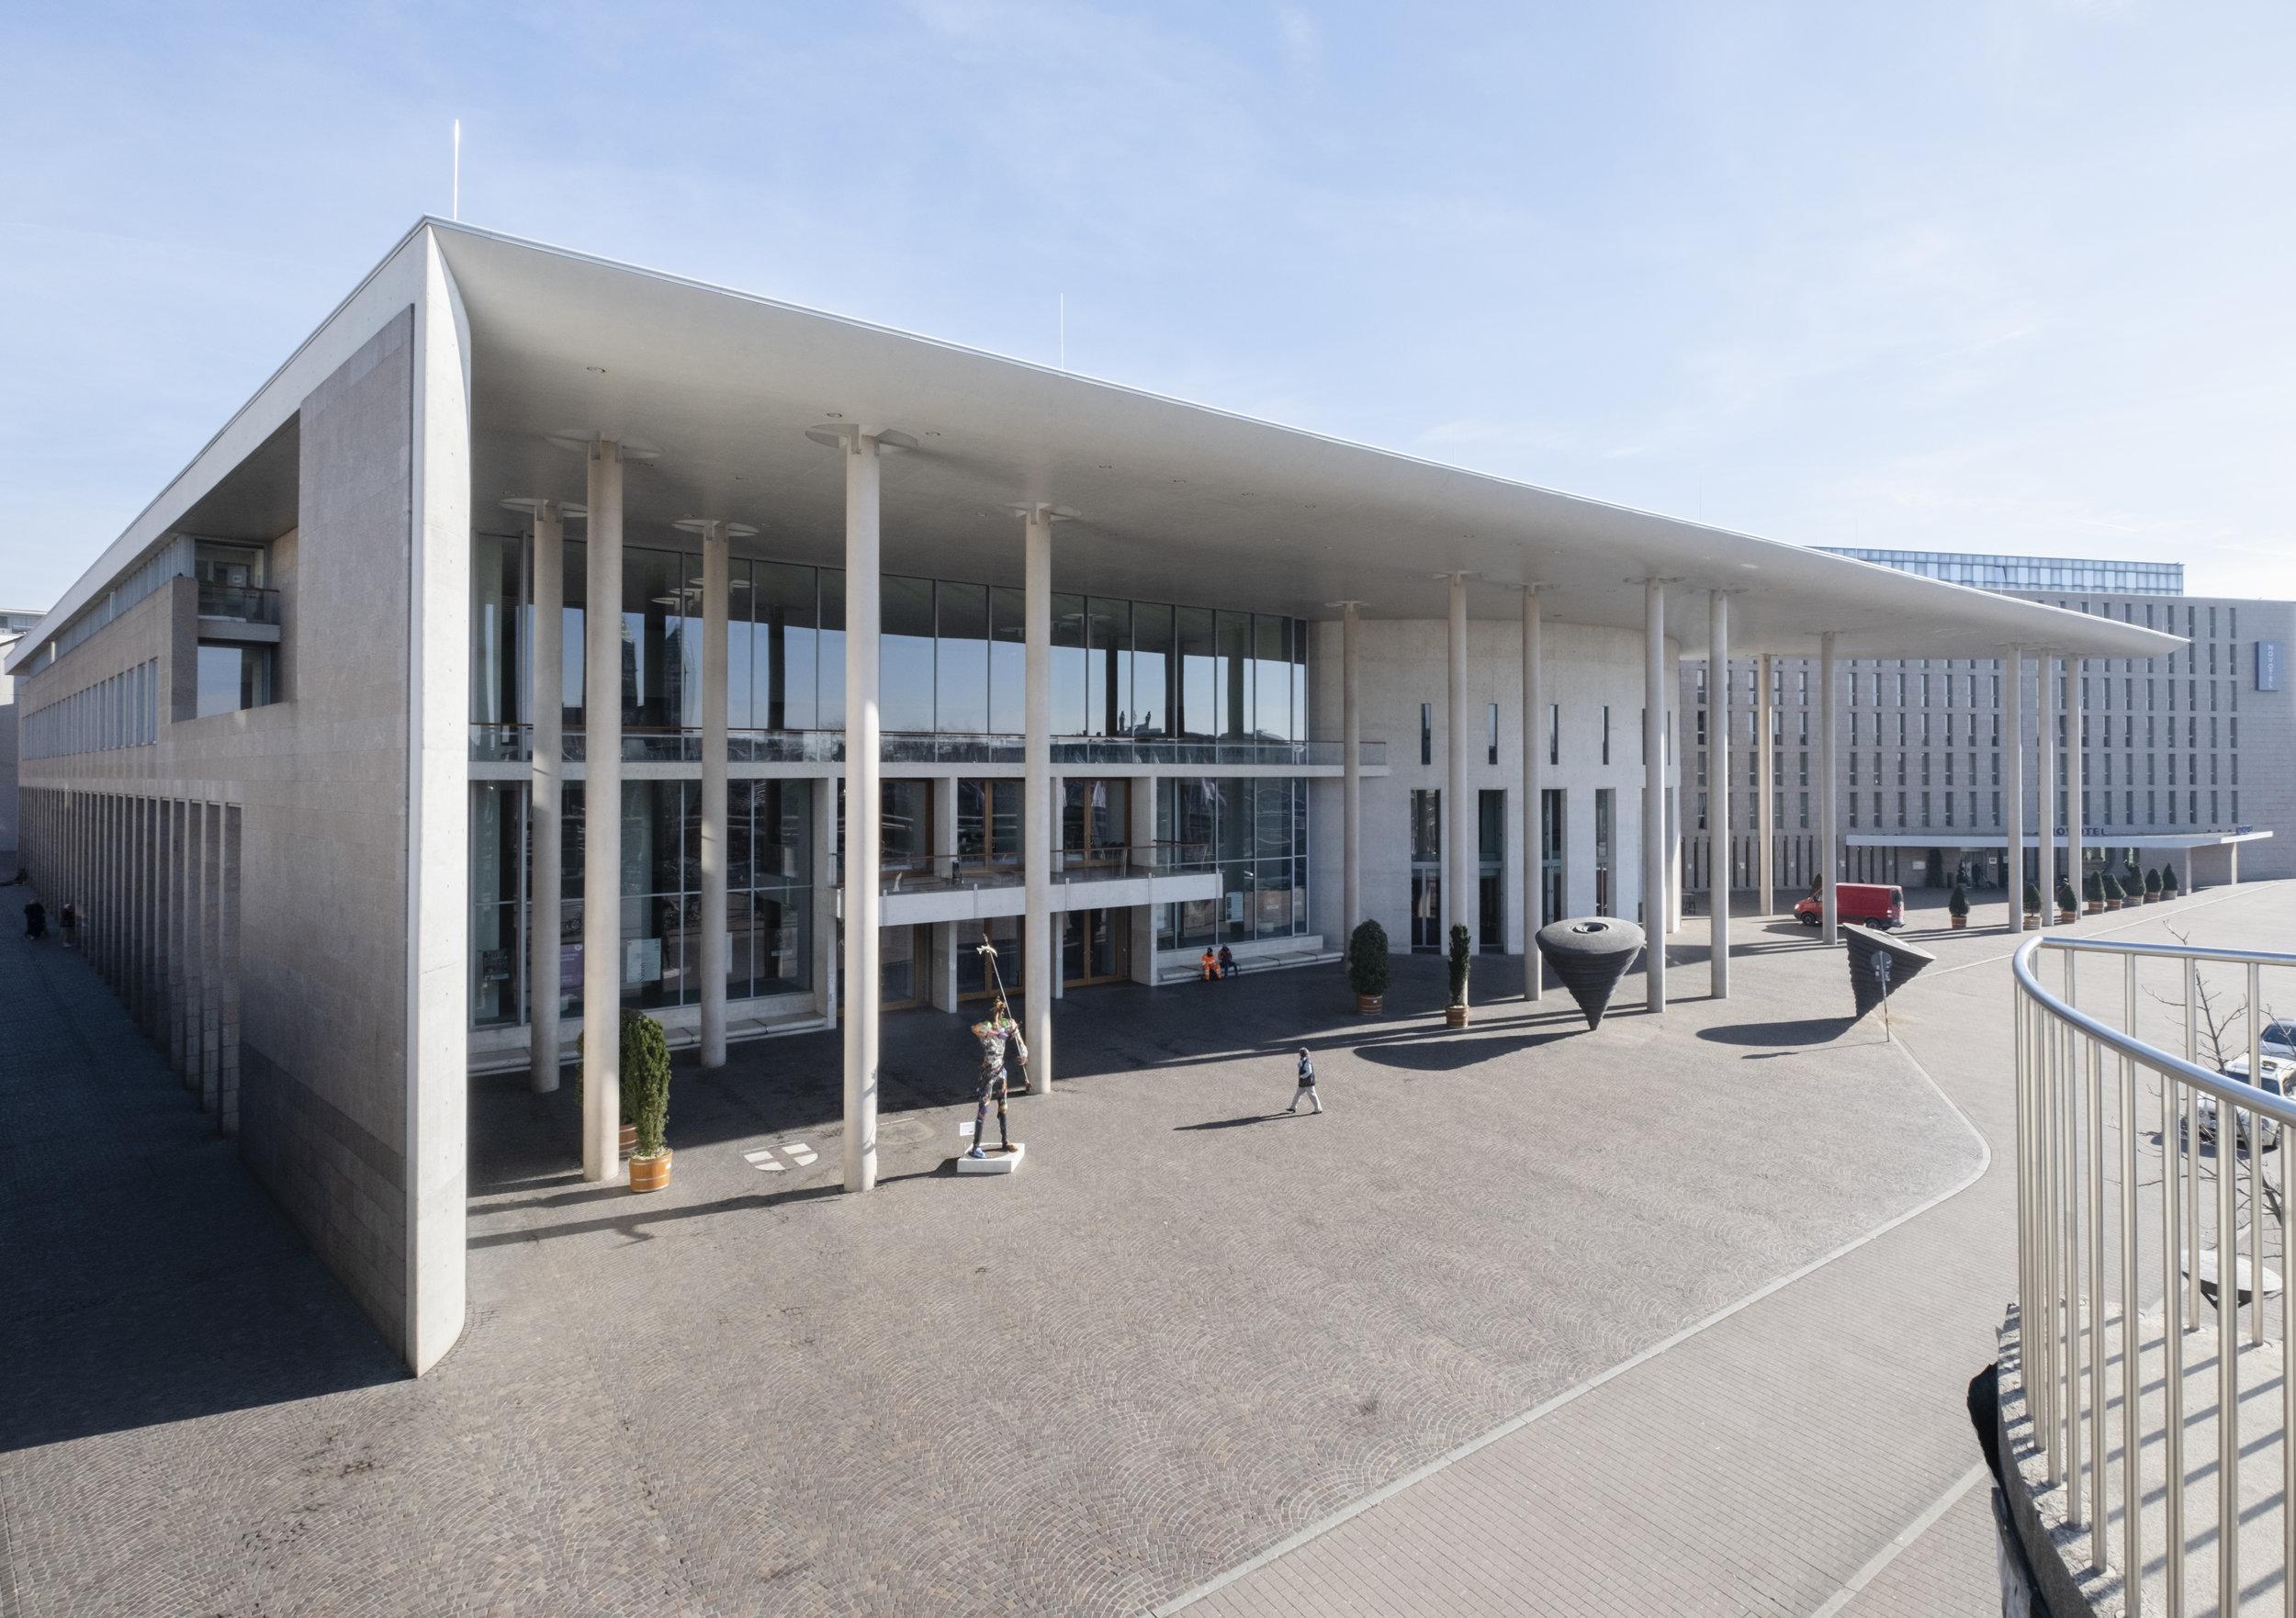 MTD_Freiburg_2019_67.jpg